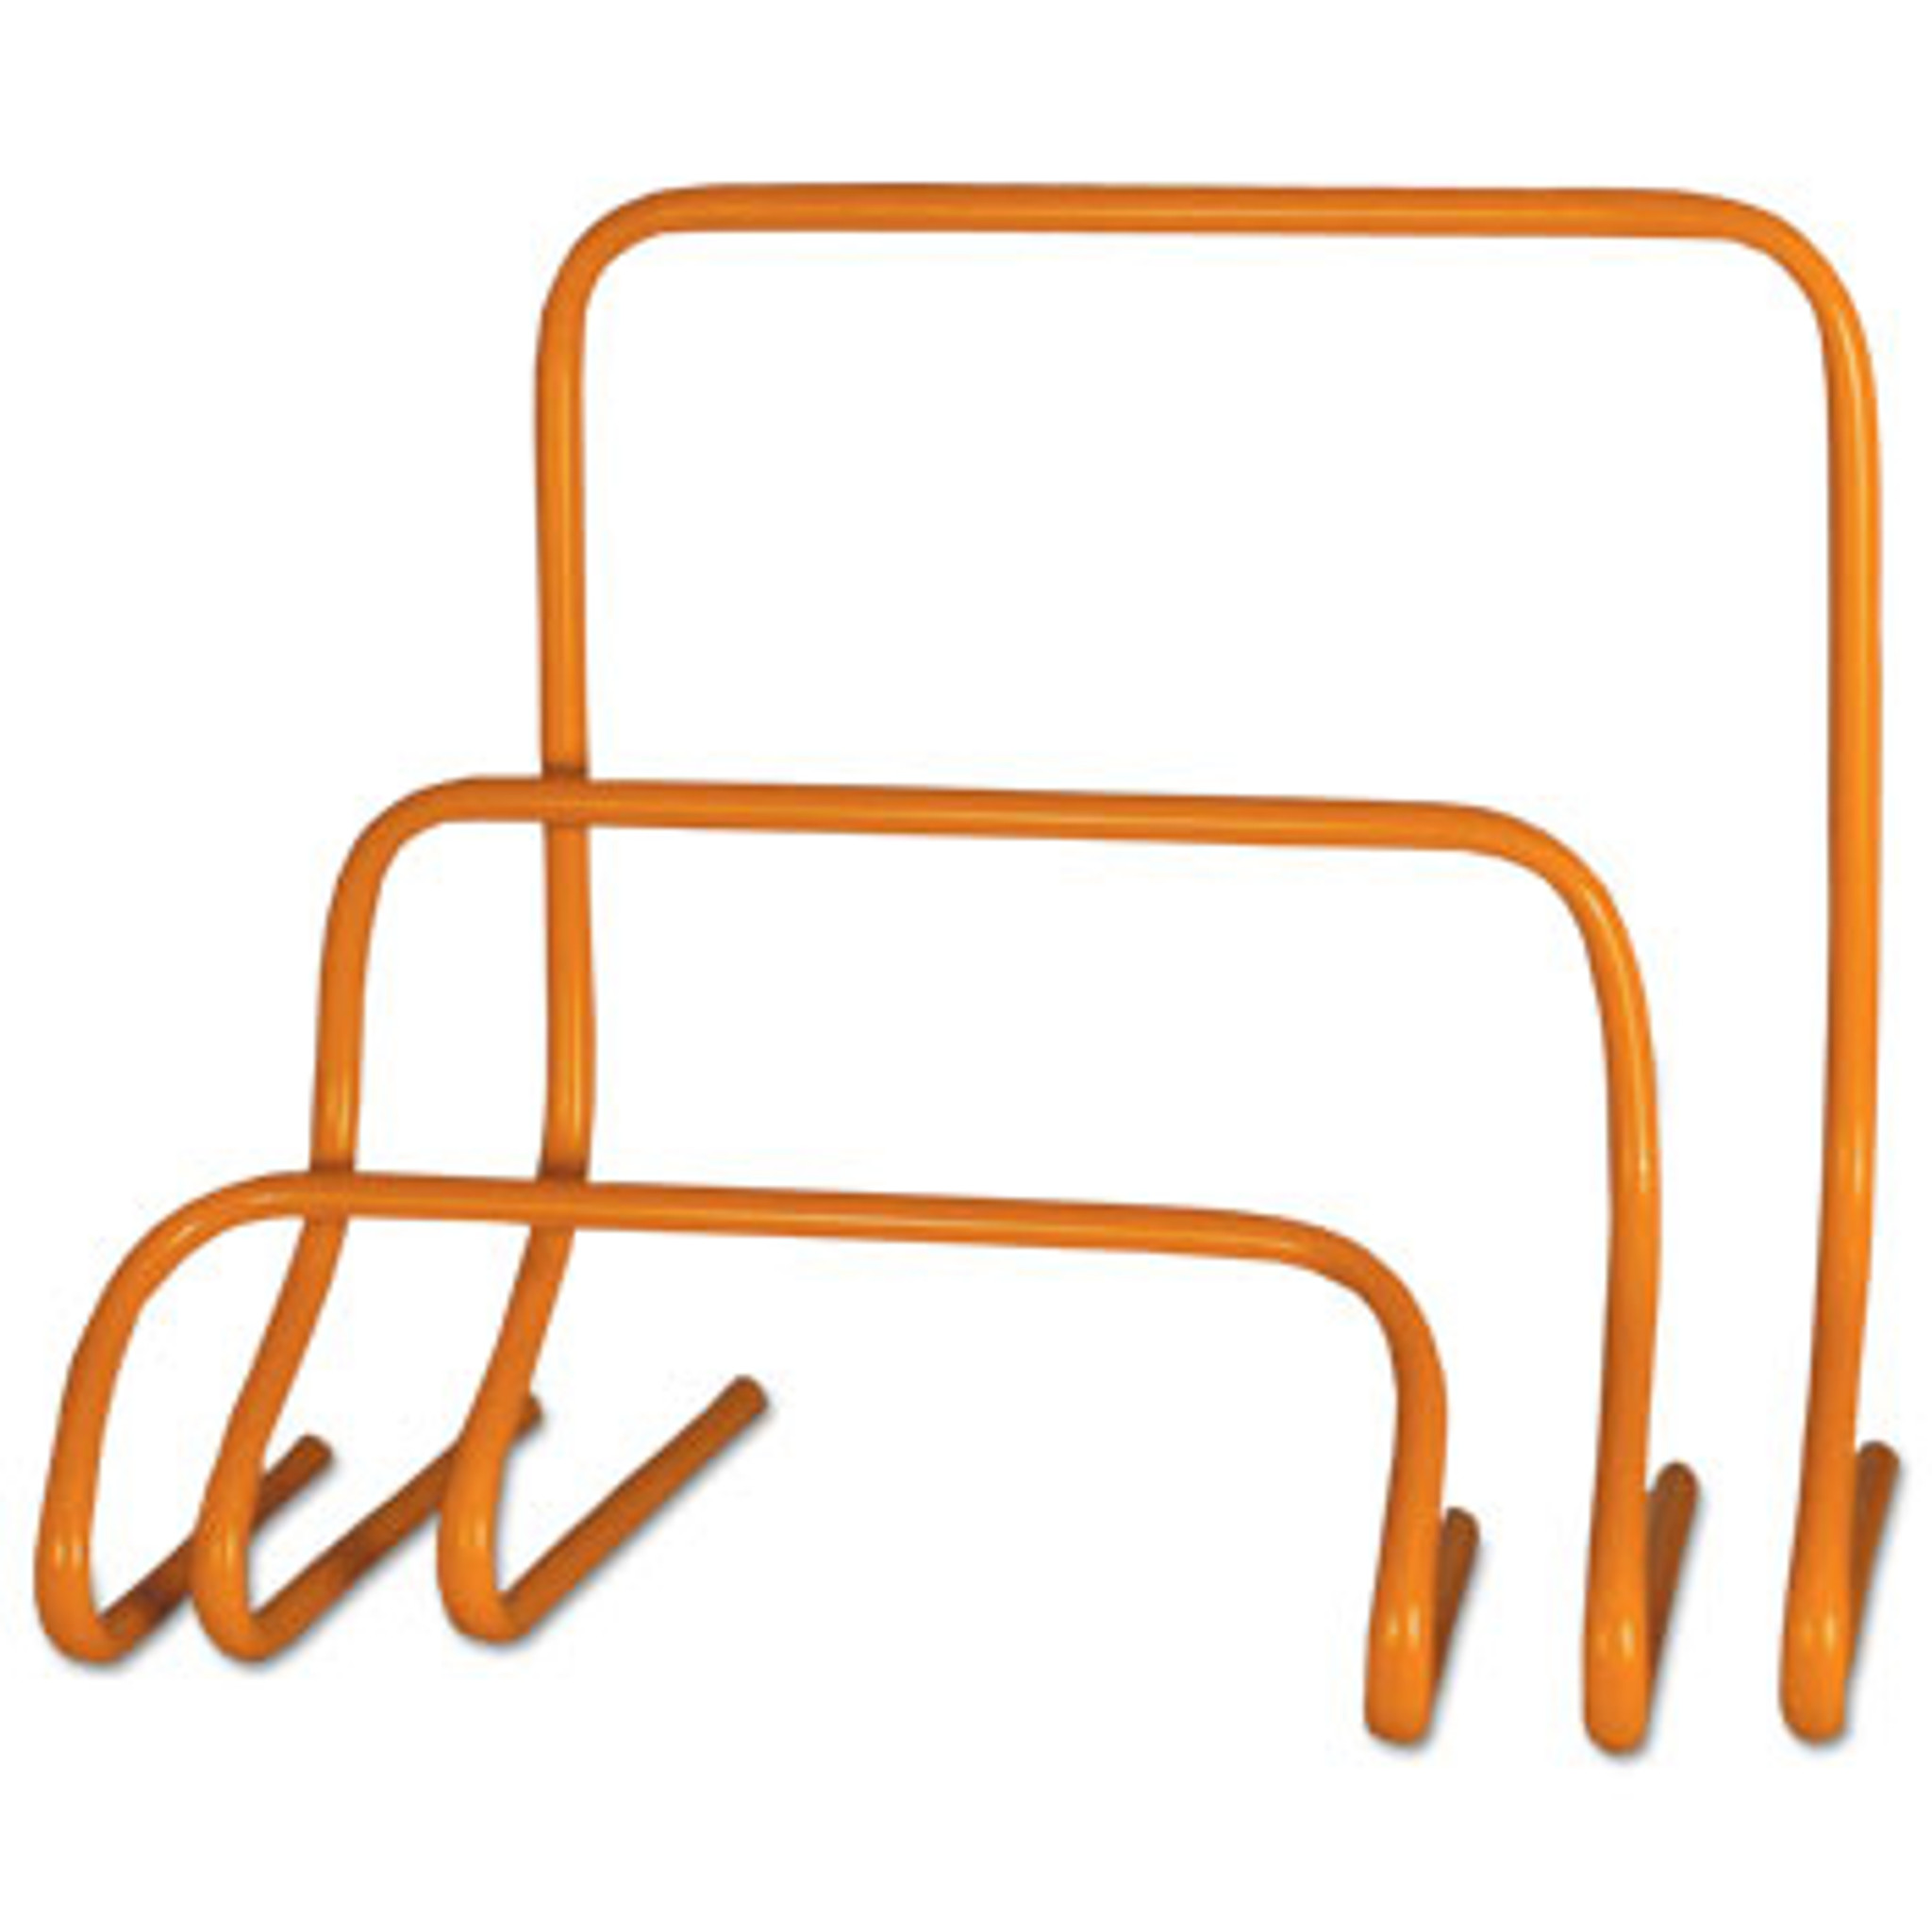 Orange Size 12 Champion Sports Speed Hurdle